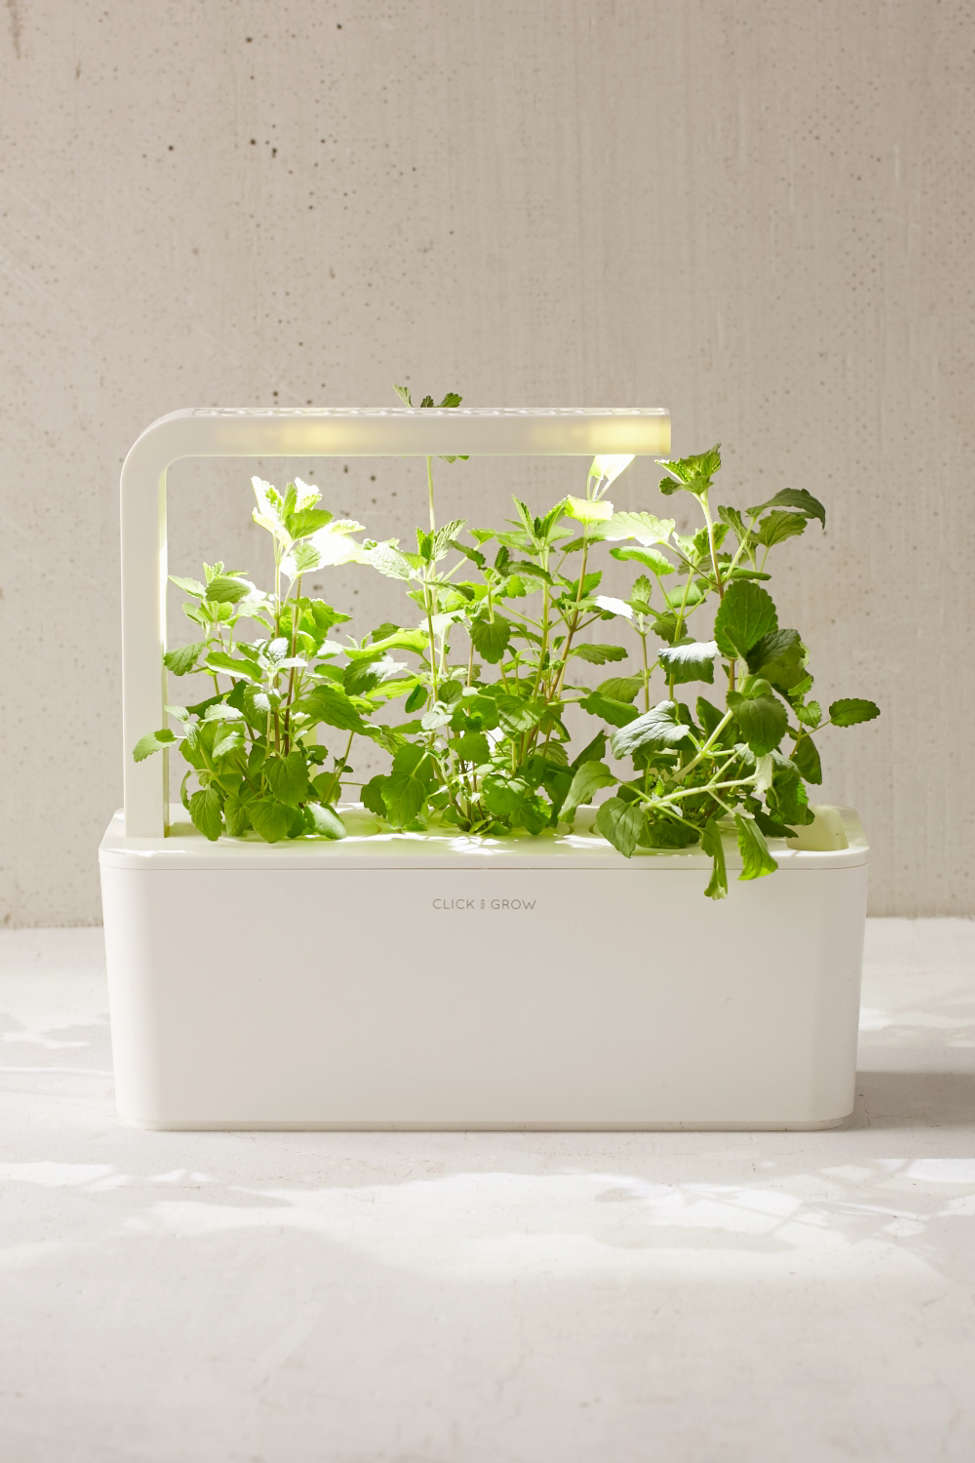 Slide View: 1: Click & Grow Plant Refill Cartridge